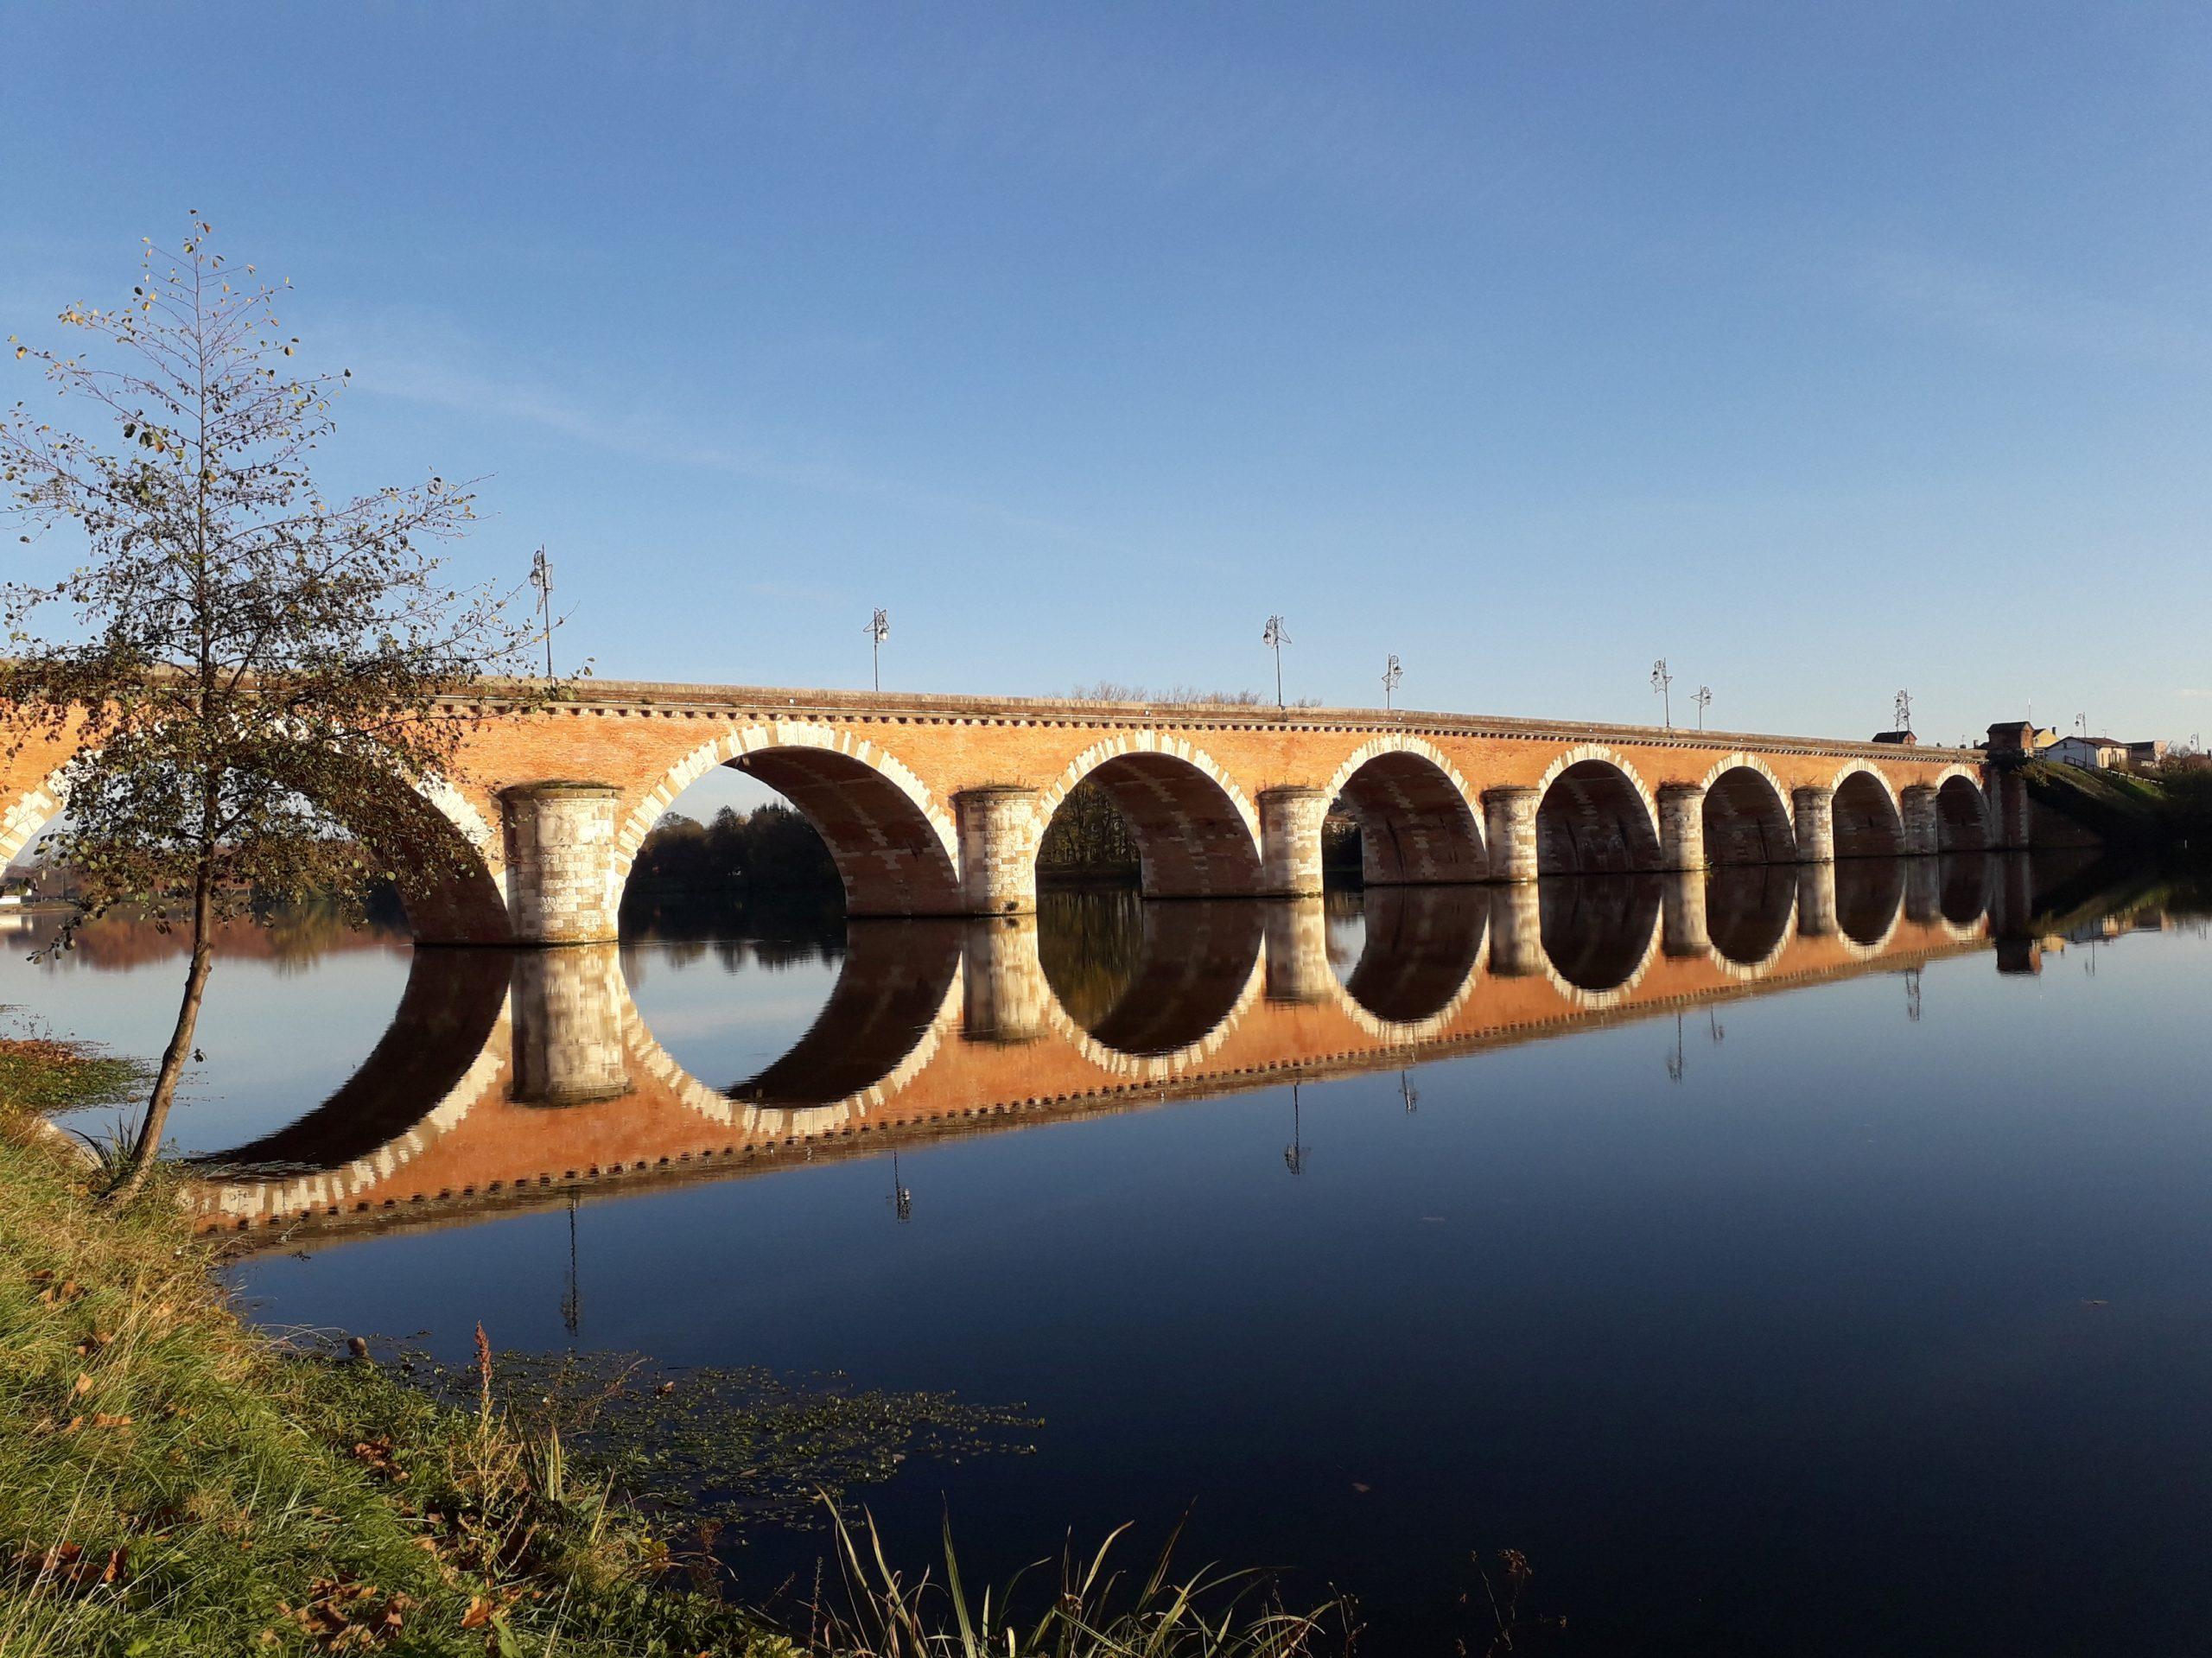 Le pont Napoleon scaled